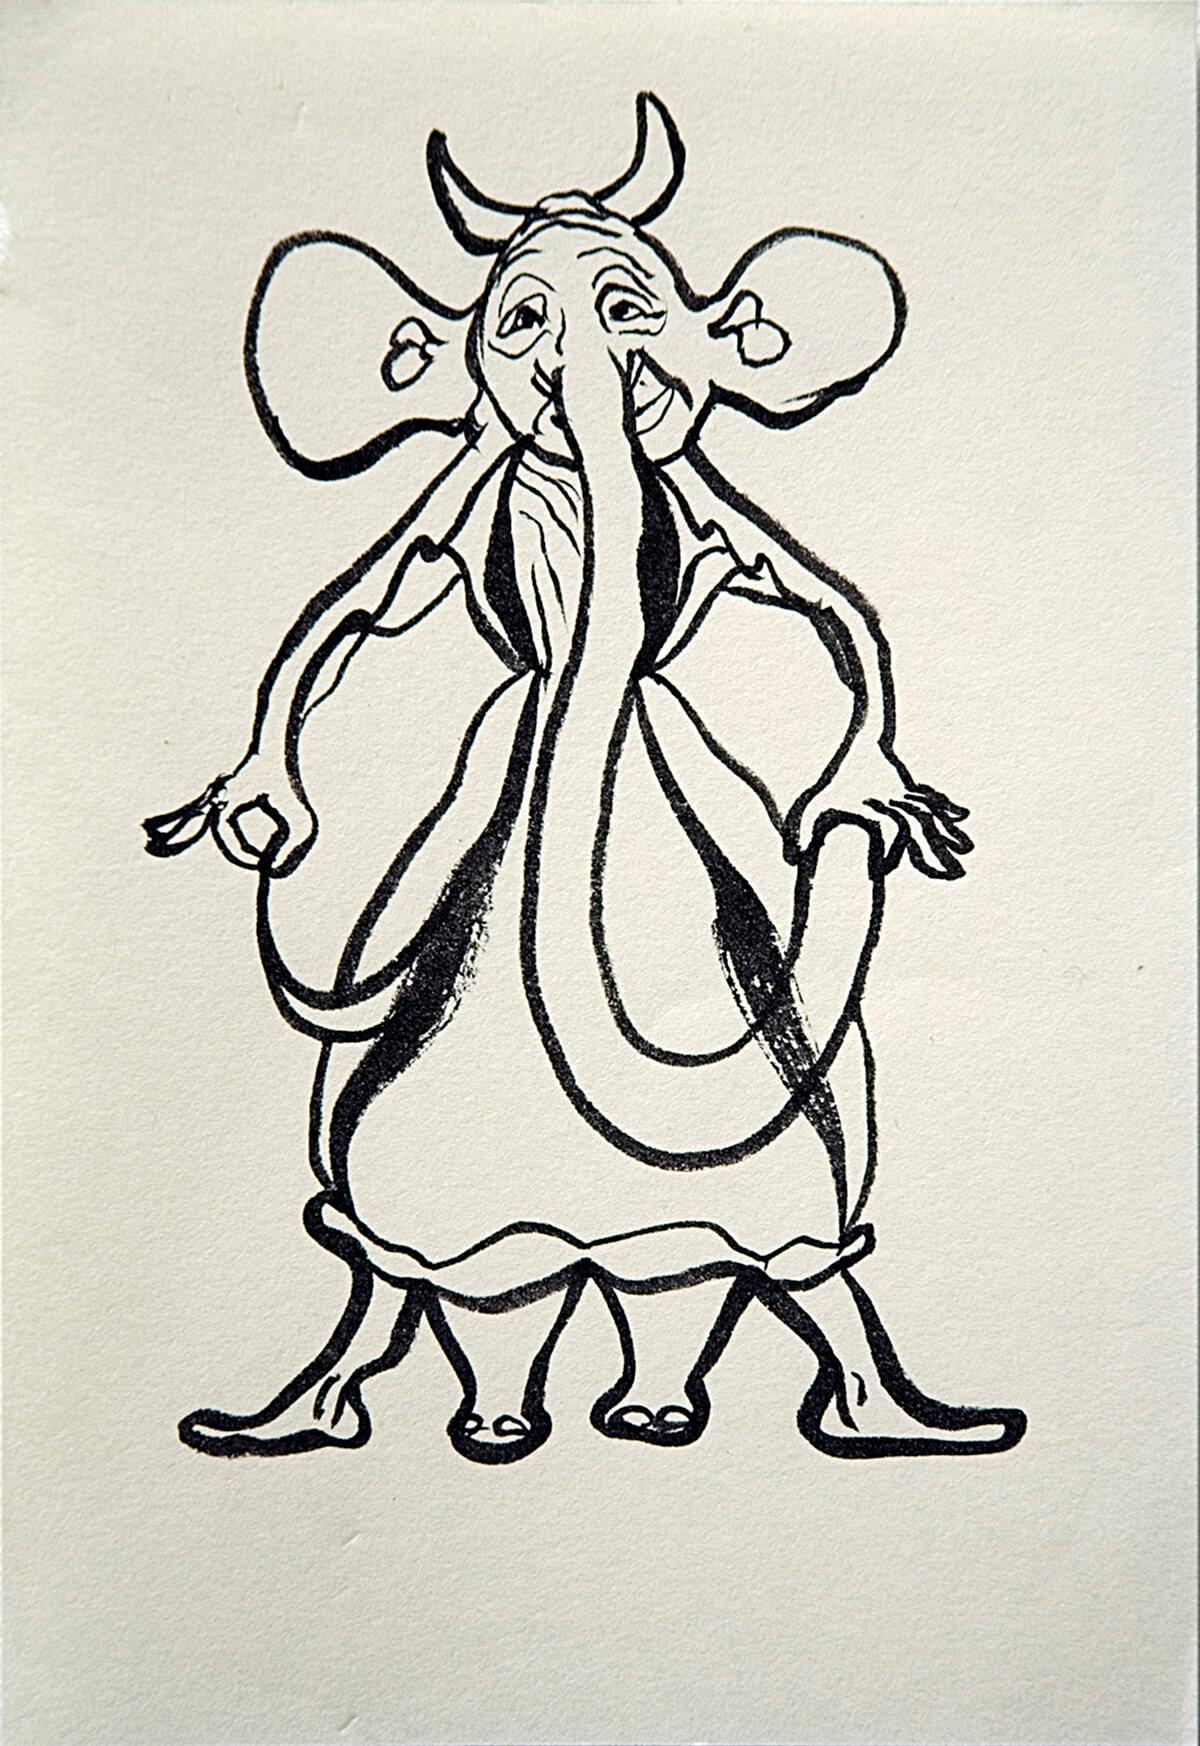 untitled (elephant god), 16 x 11 cm, ink on paper, 2012